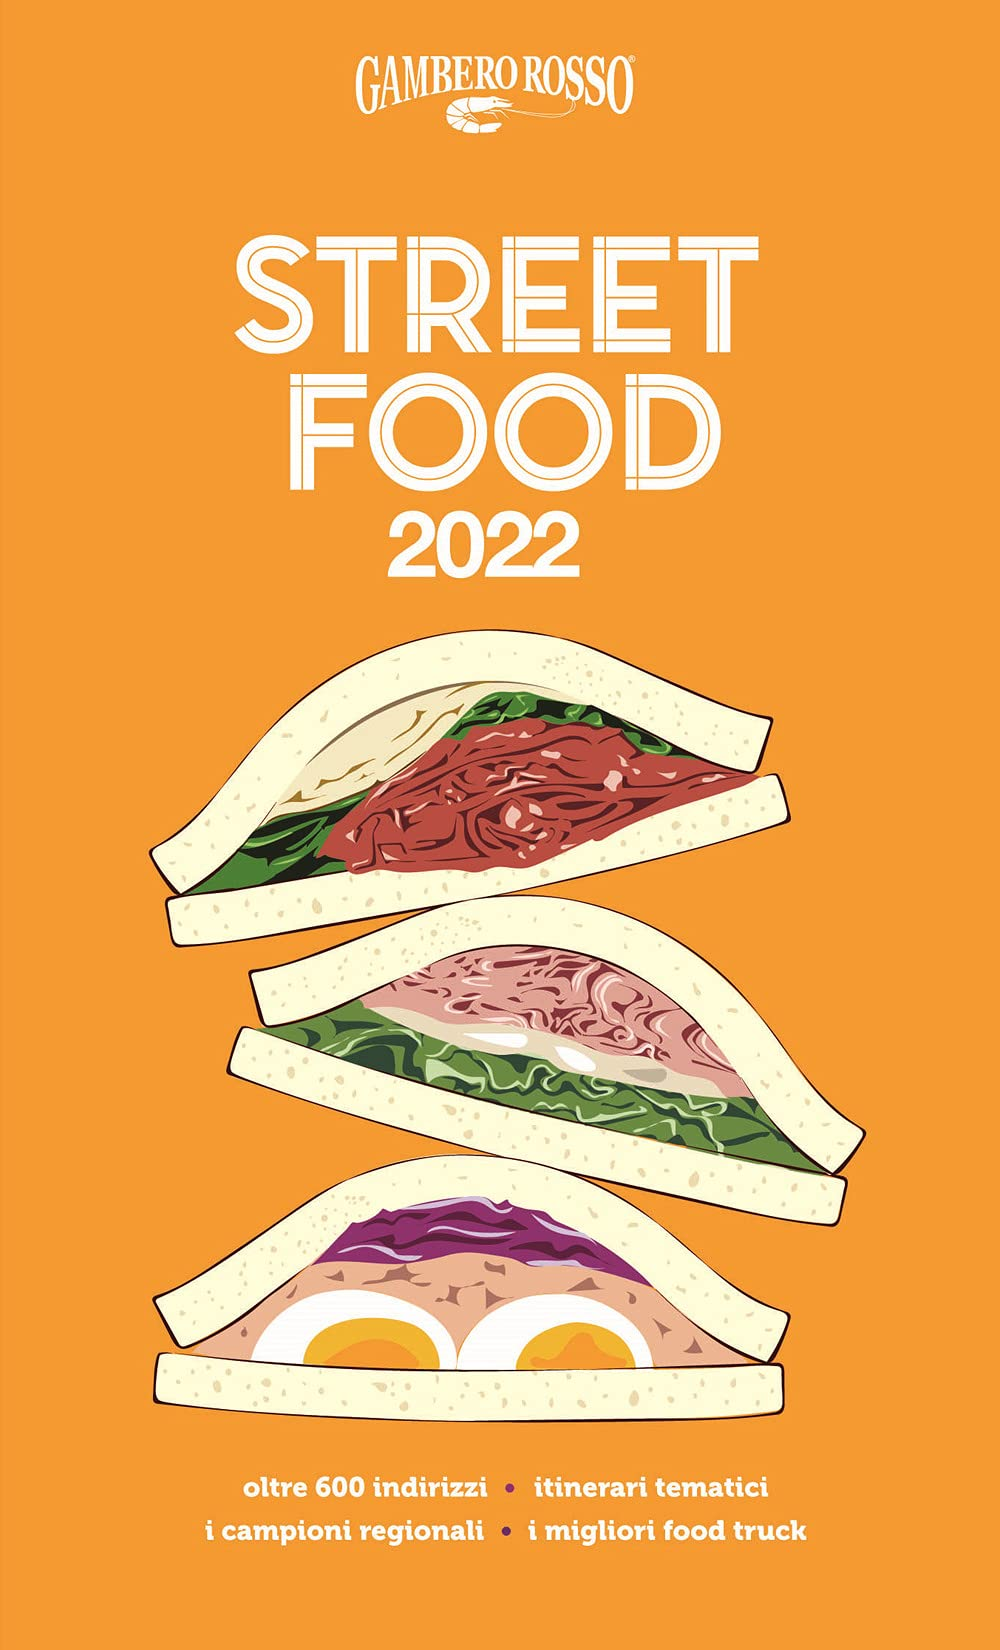 Recensione di Street Food 2022 – Gambero Rosso